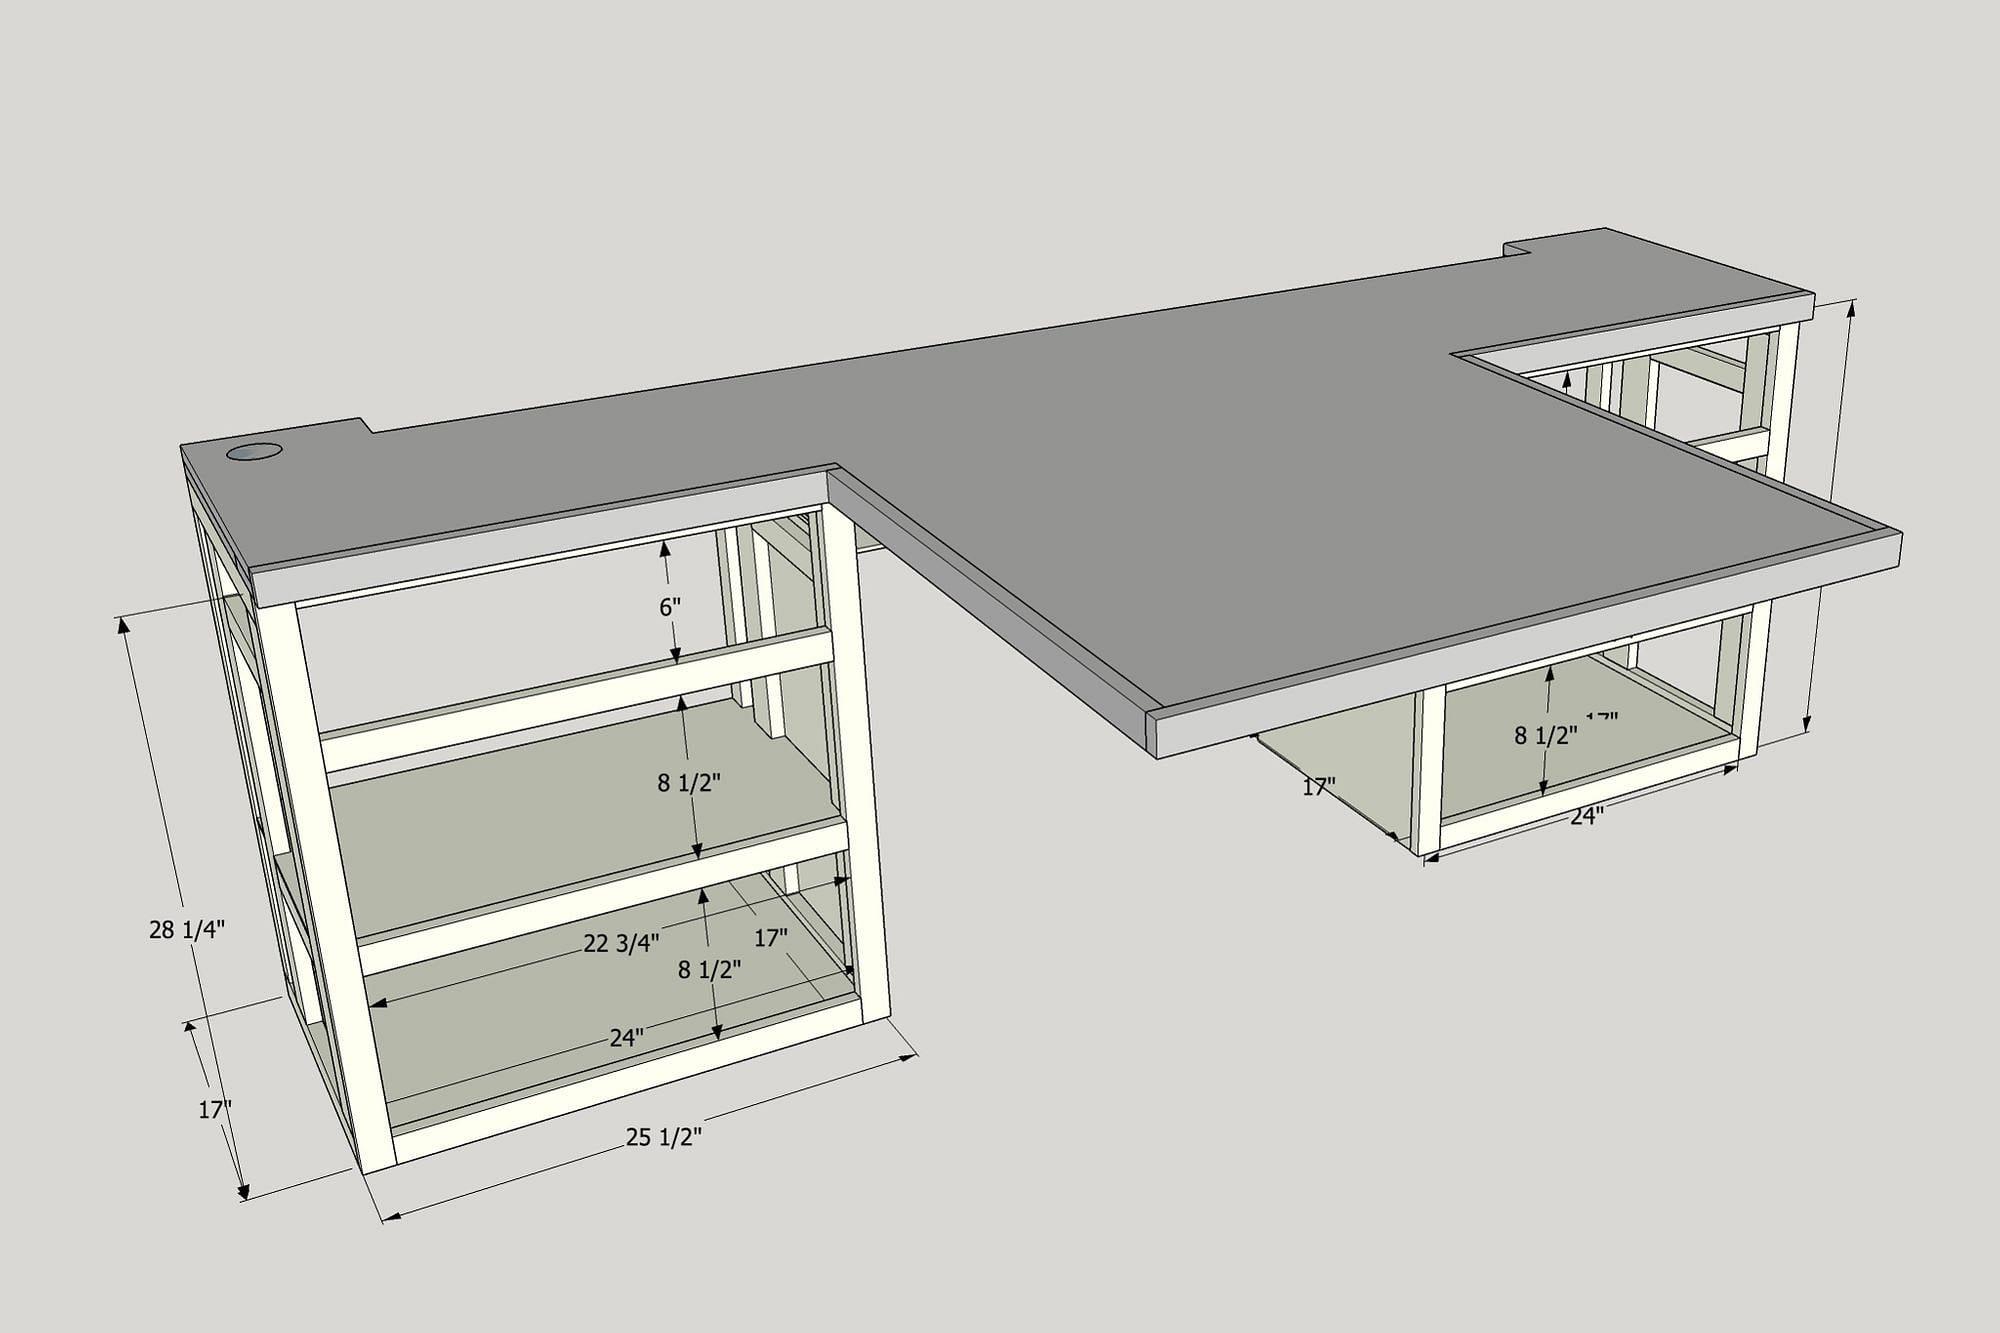 SketchUp RV Desk